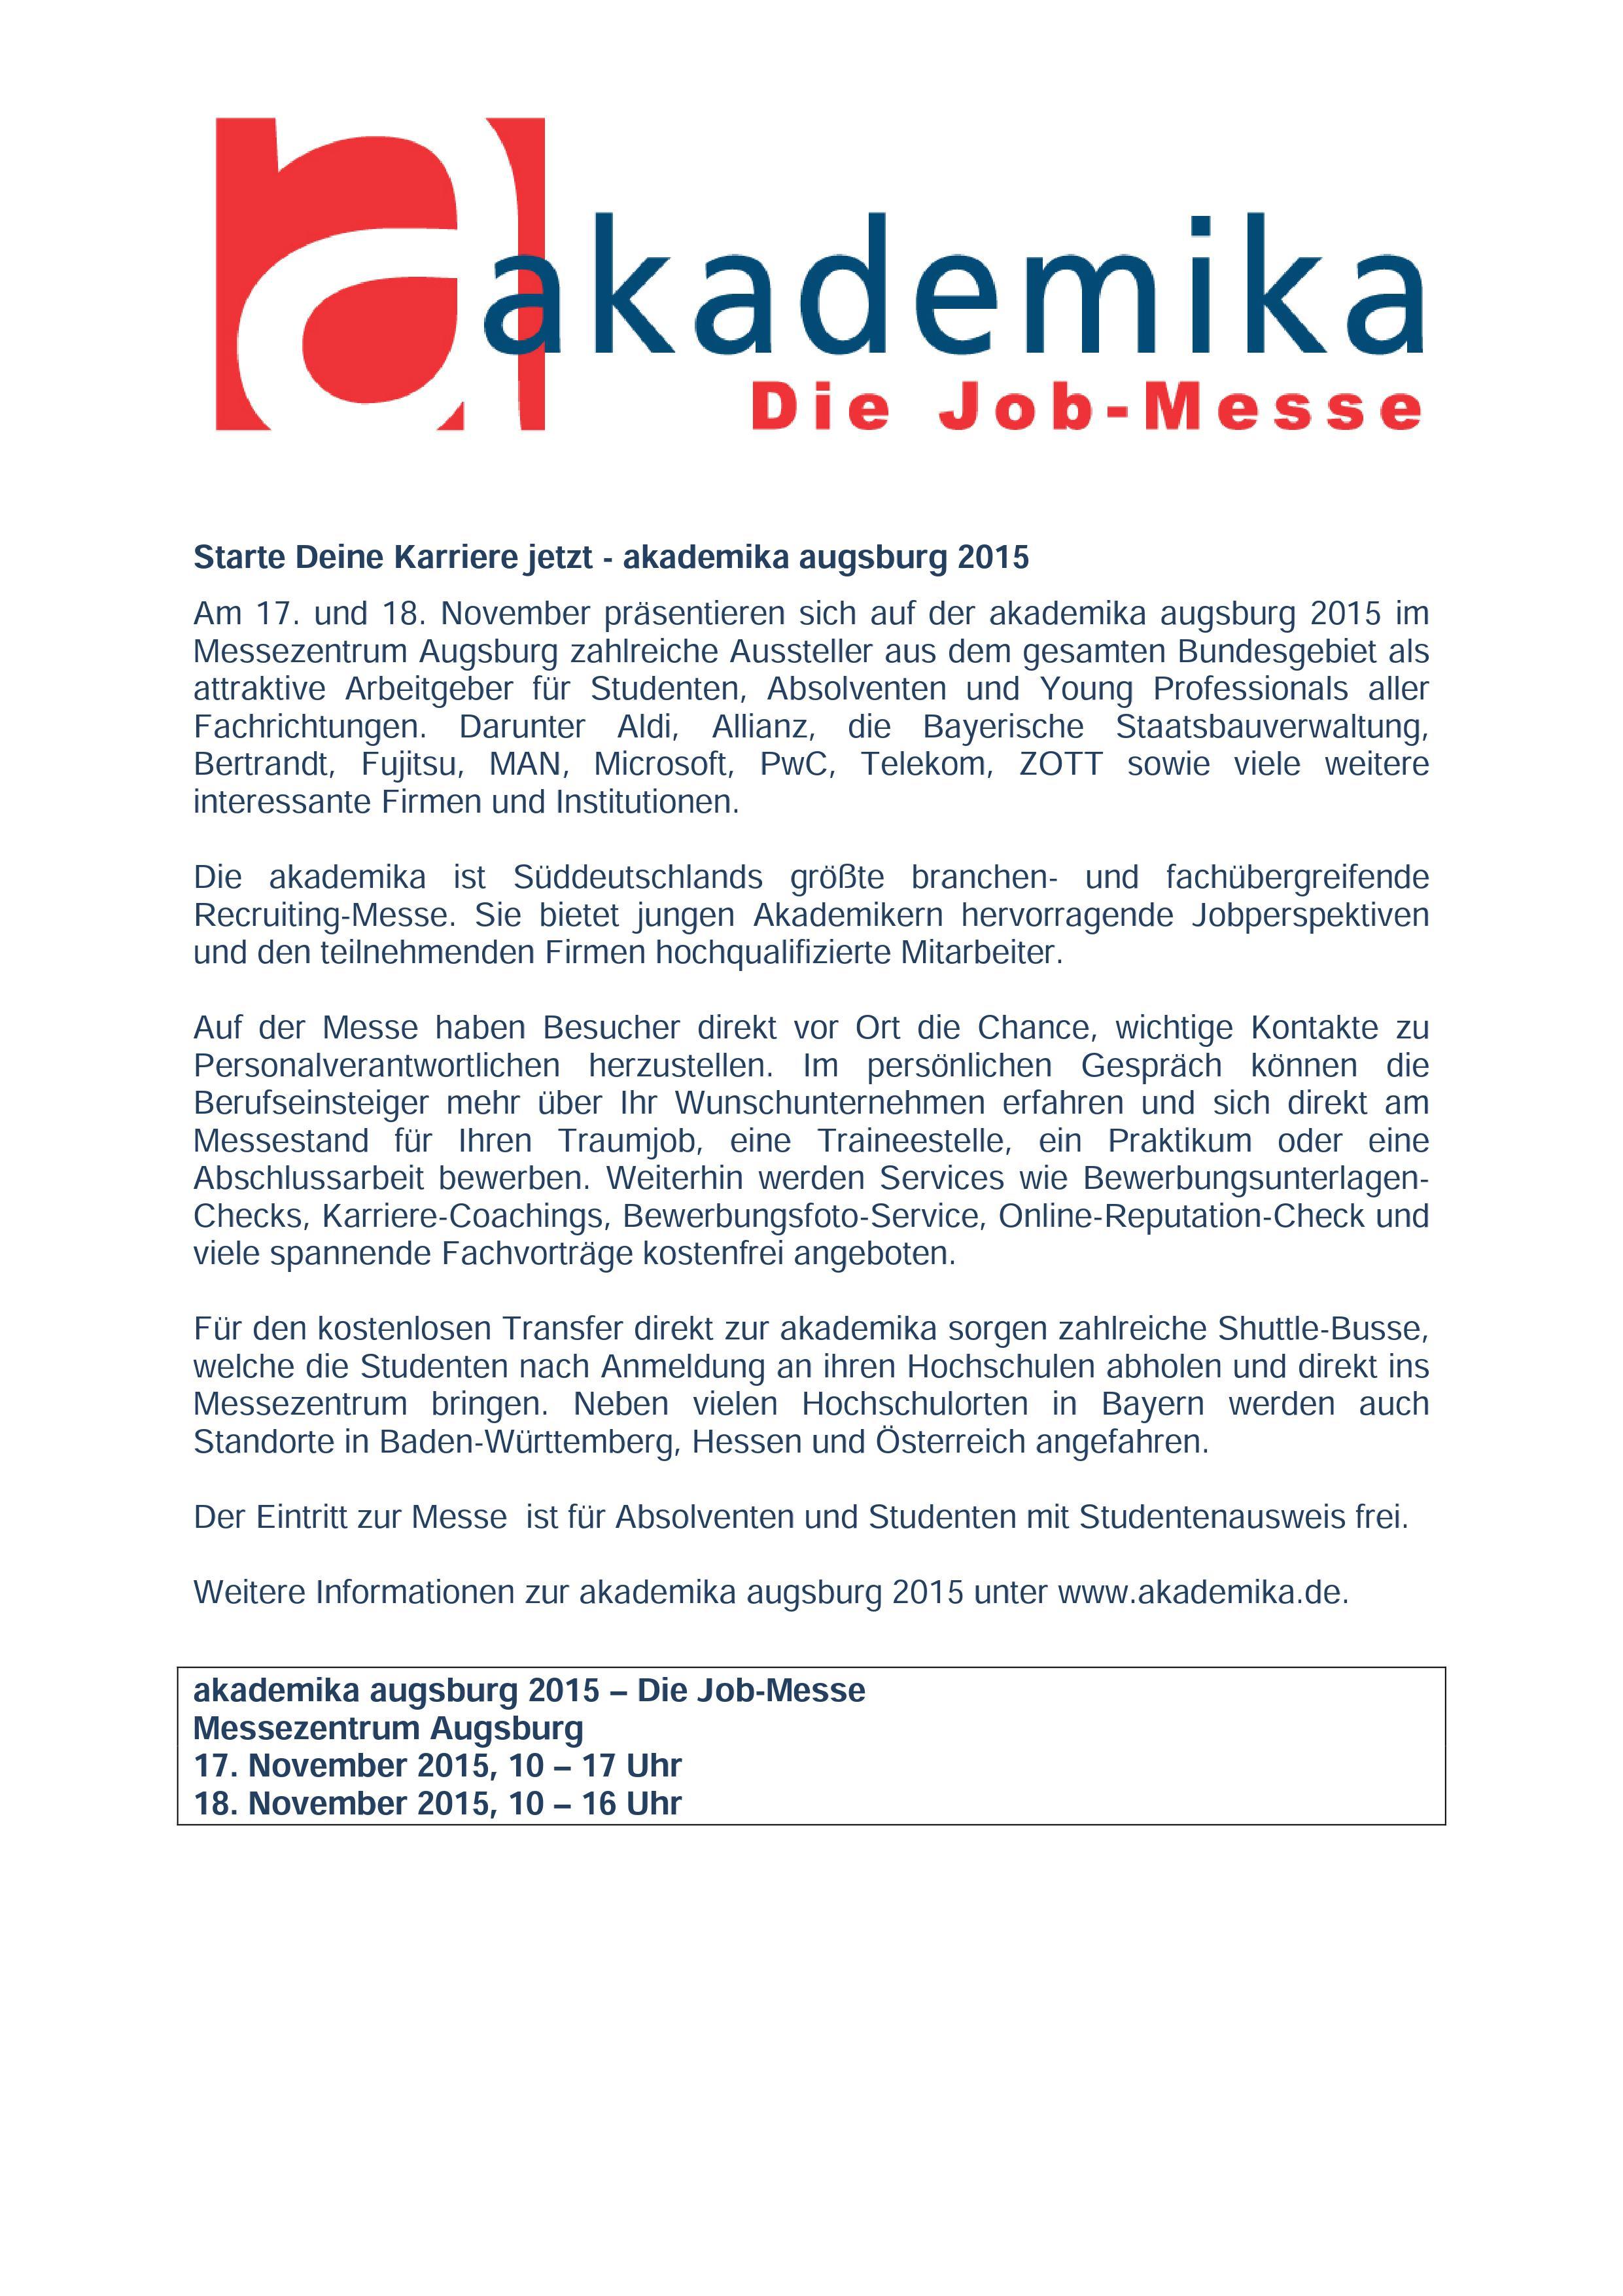 Messe Augsburg Info